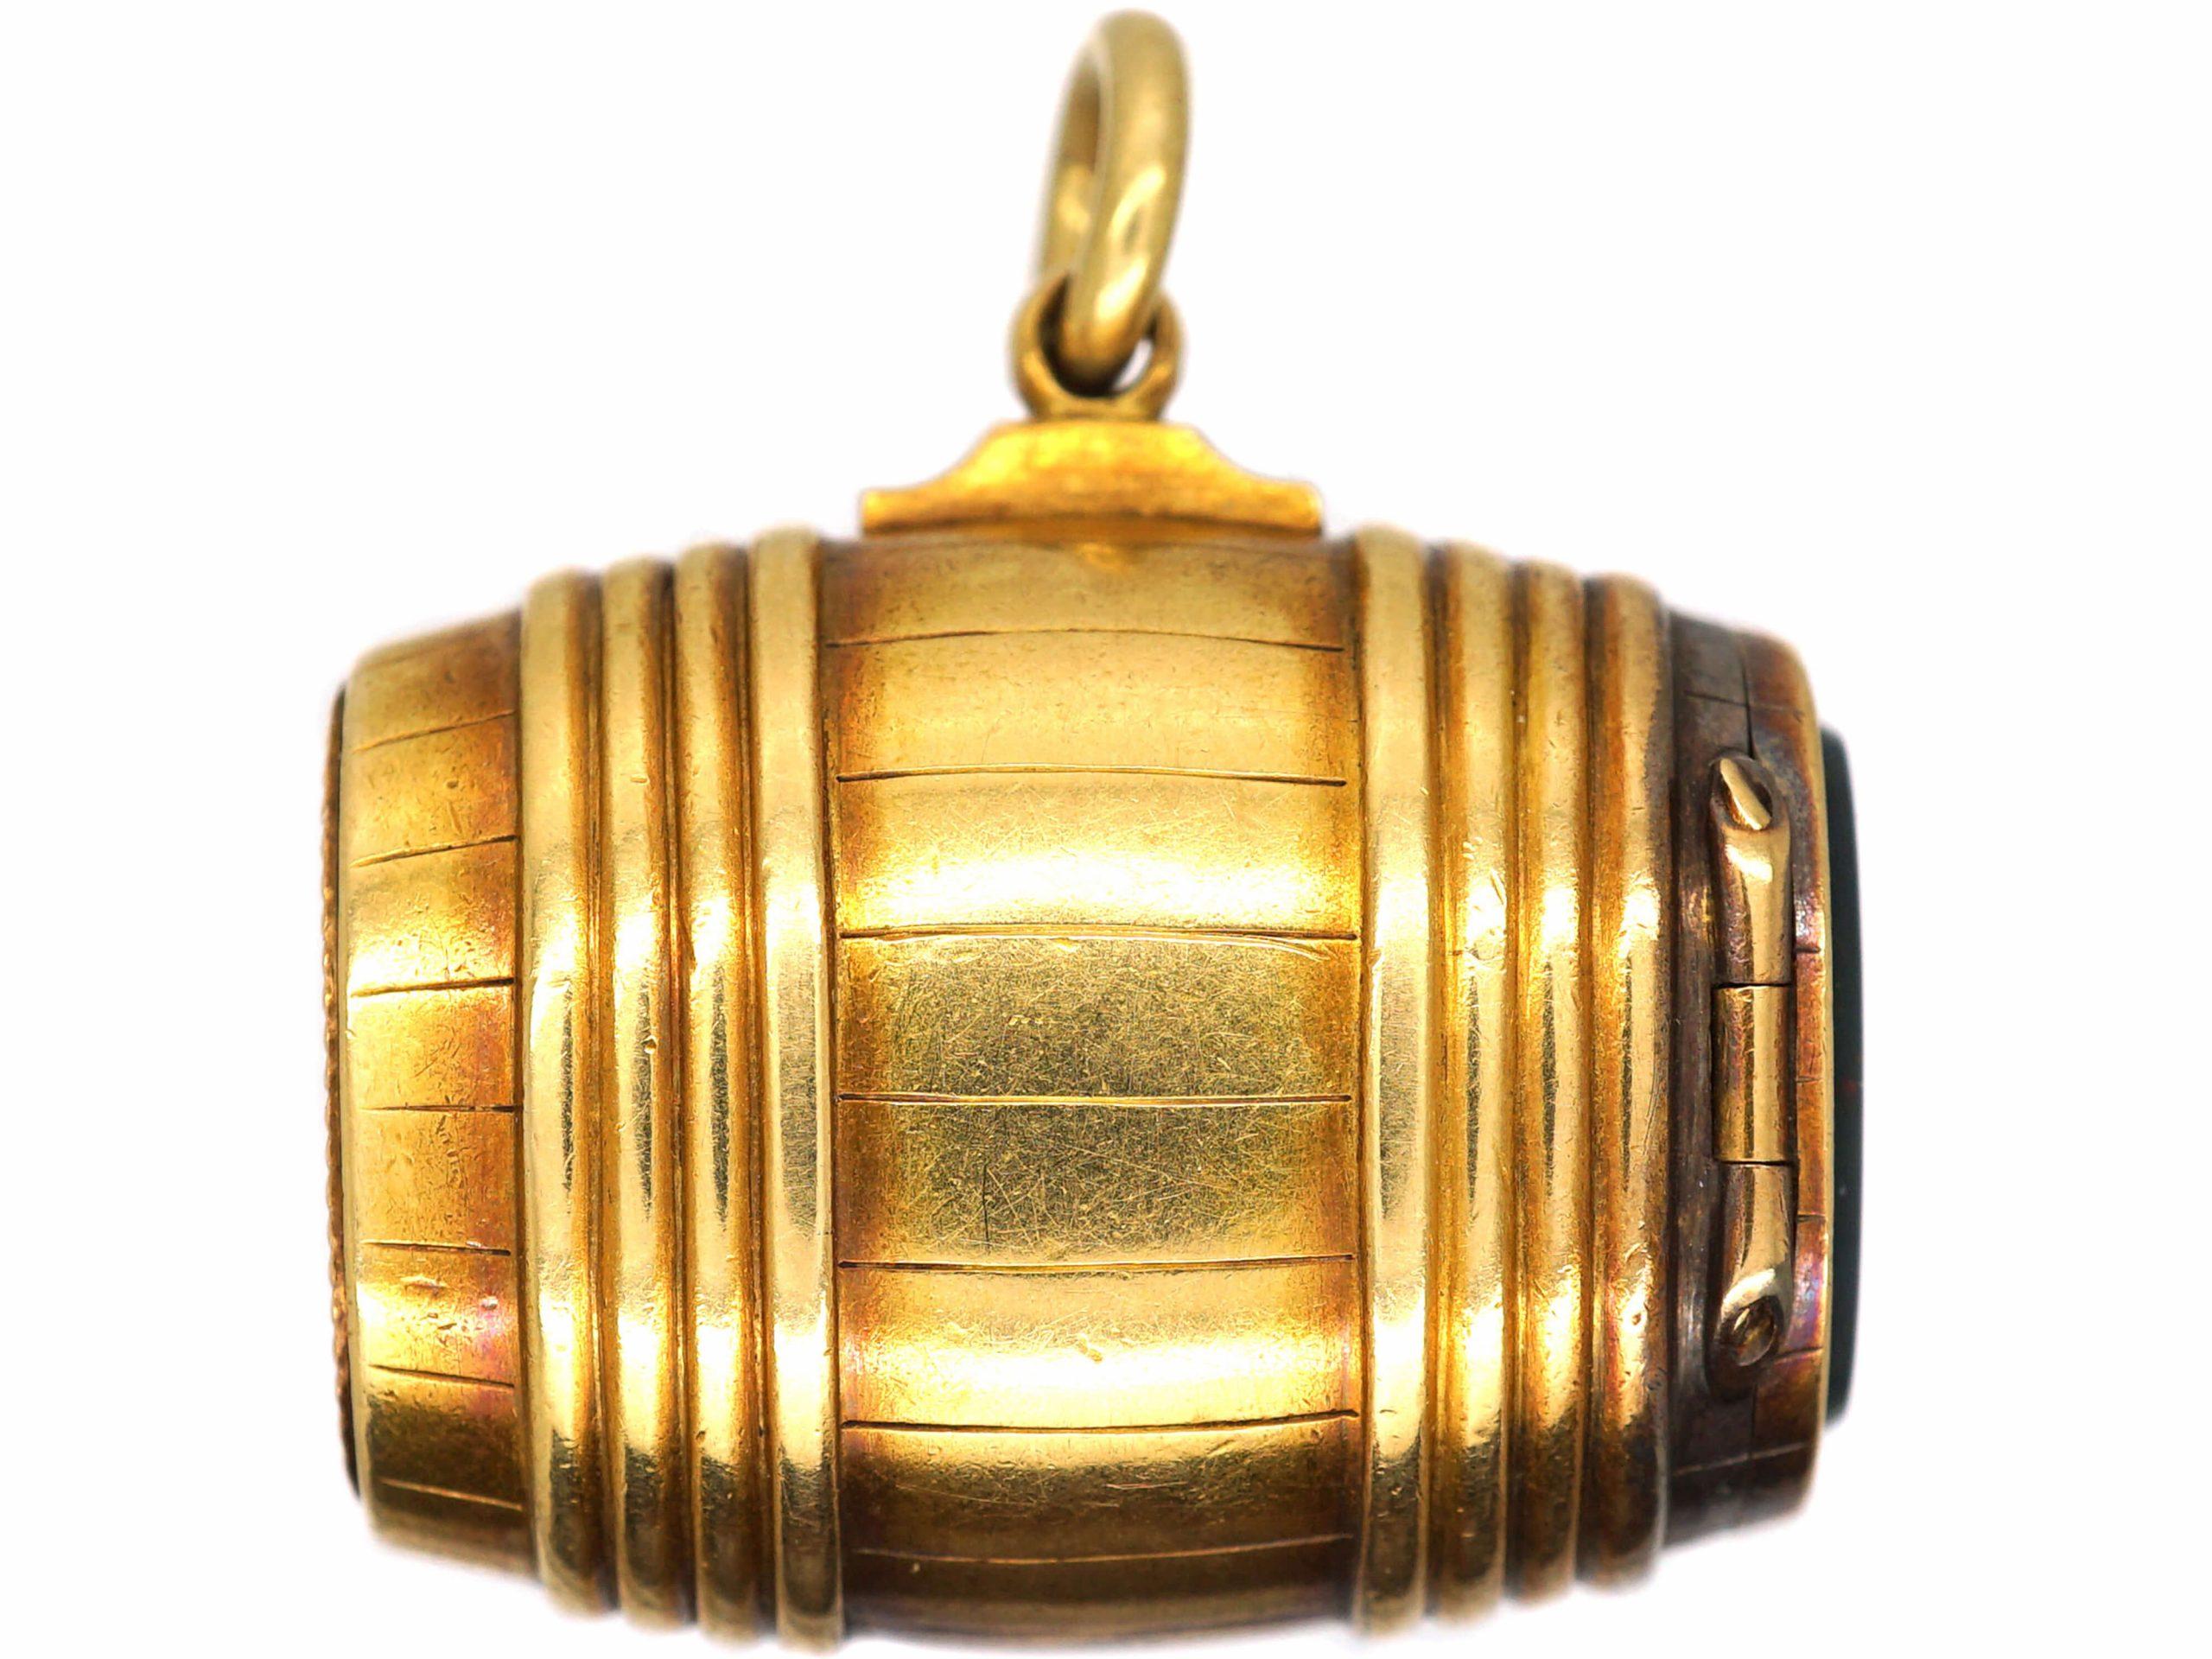 Victorian 18ct Gold Vesta Case Pendant with Bloodstone Base